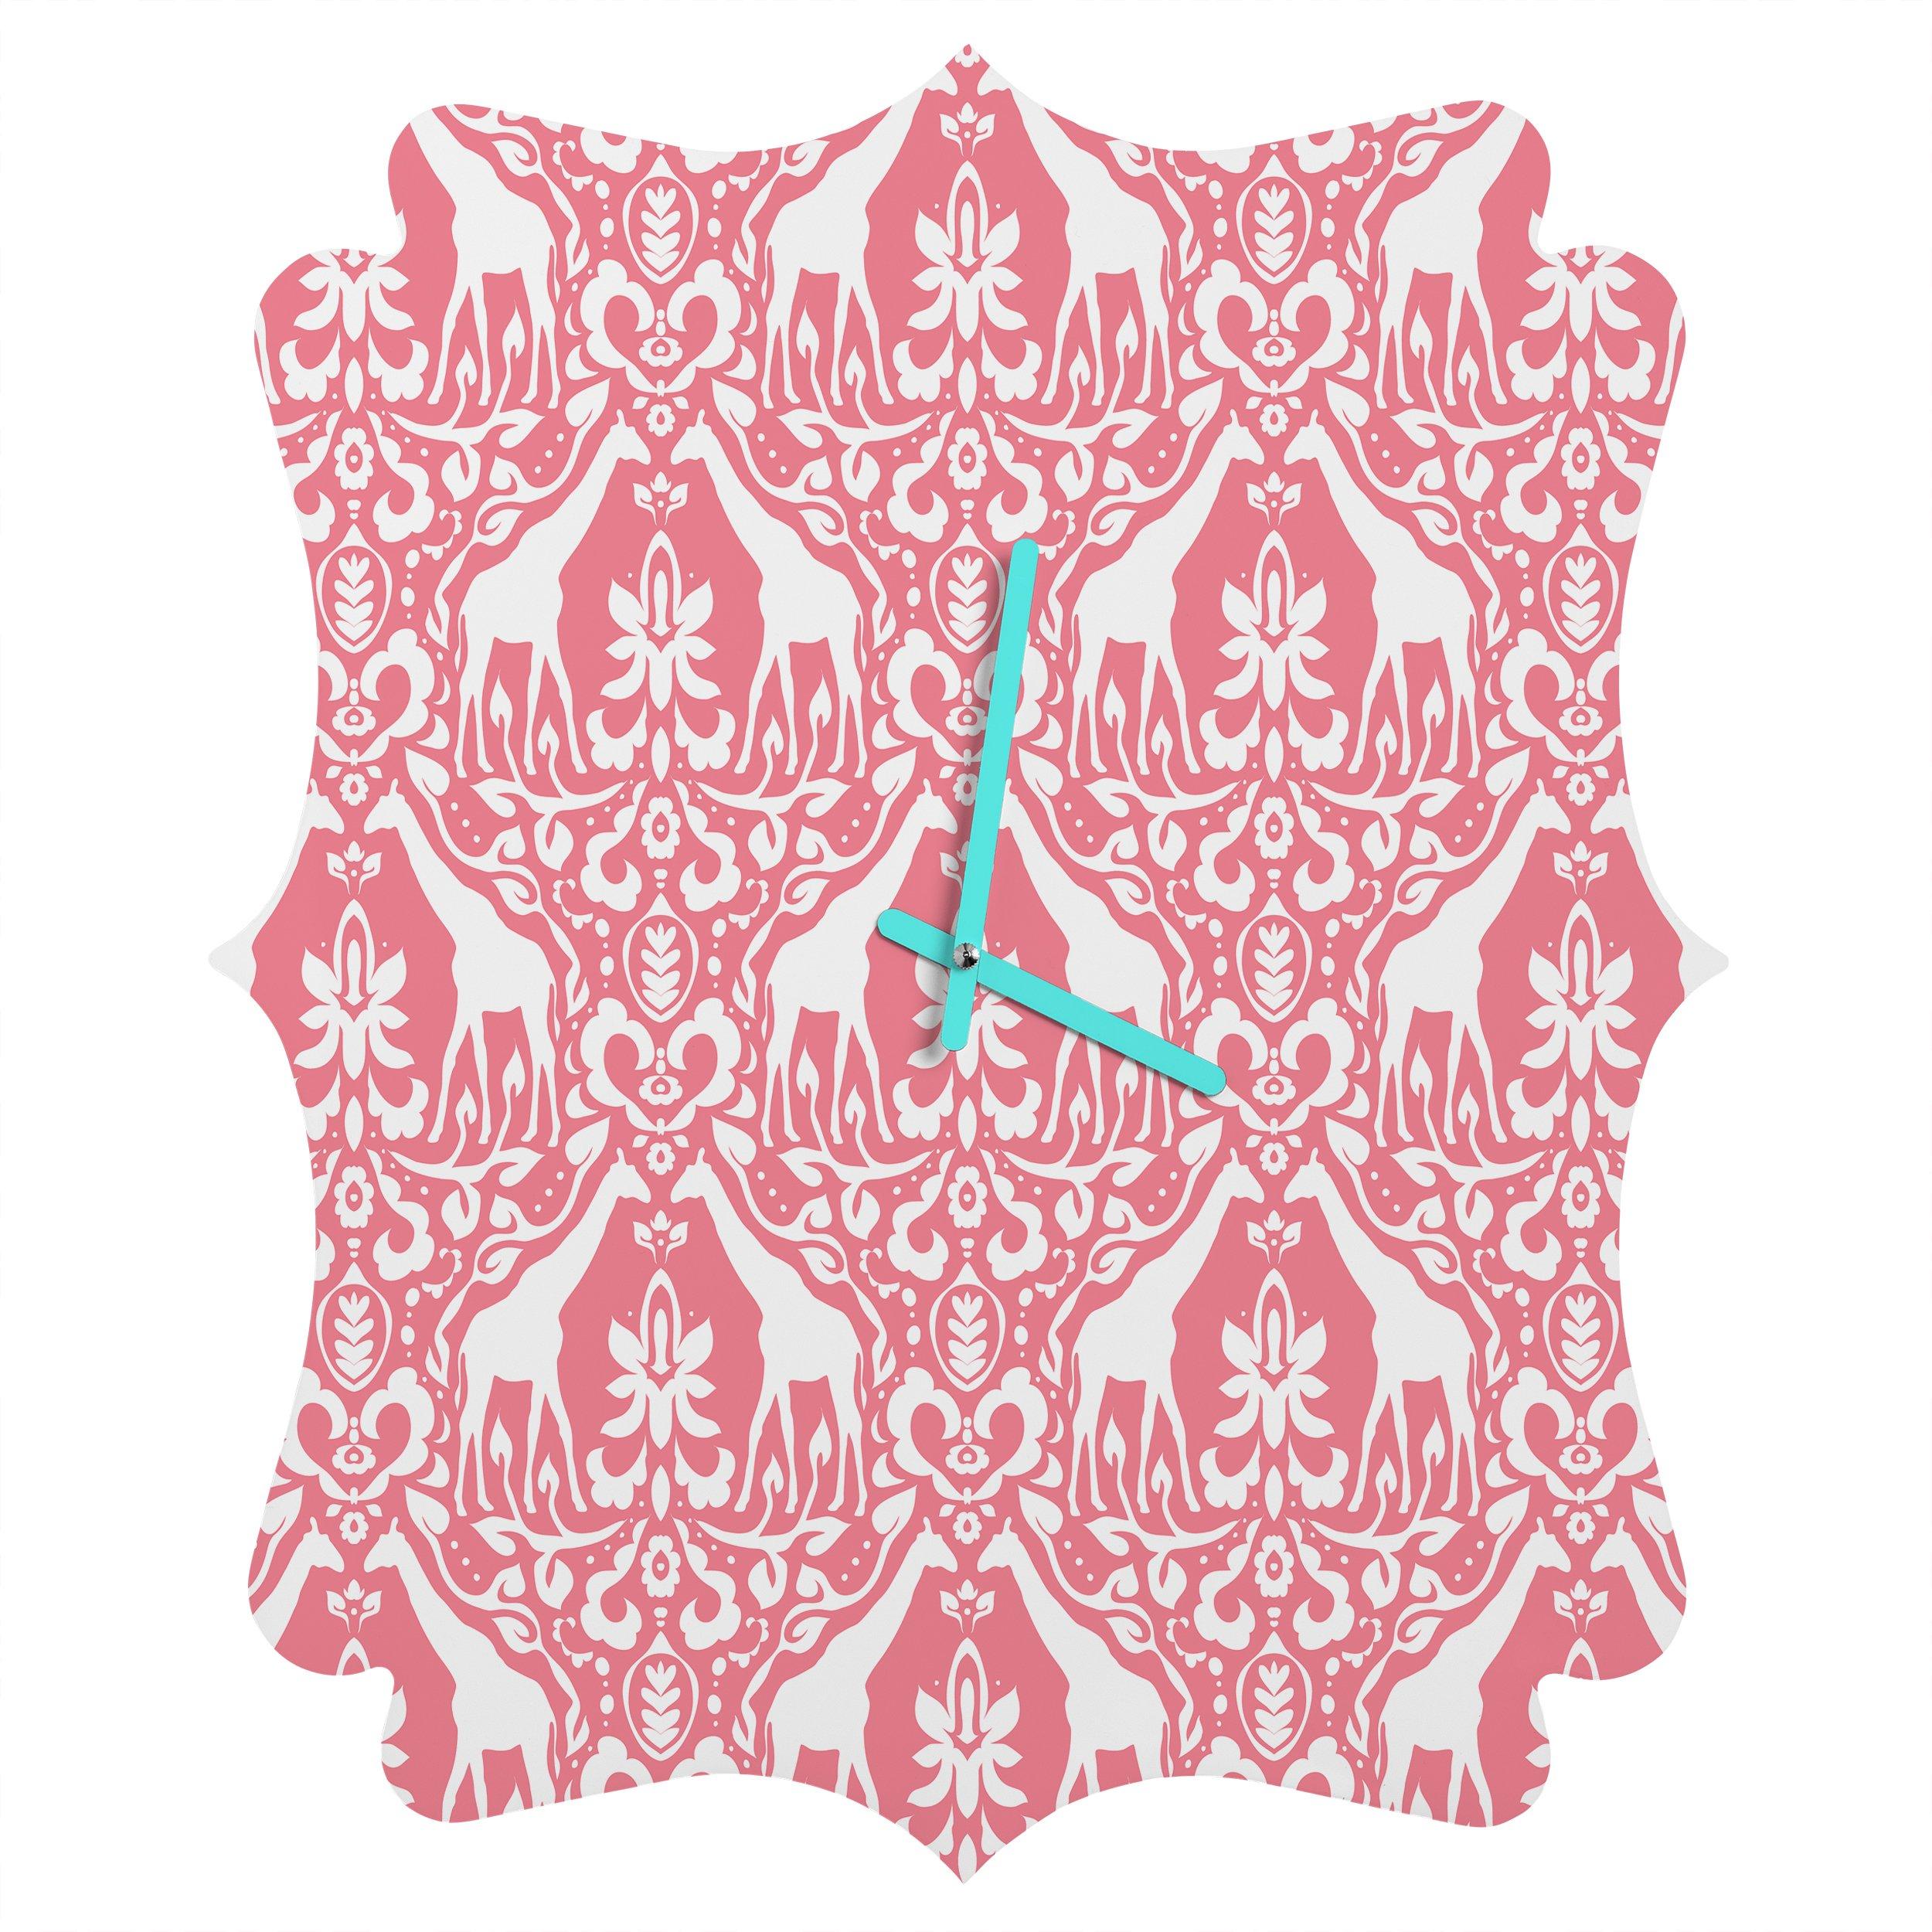 Deny Designs Jacqueline Maldonado, Giraffe Damask Salmon Pink, Quatrefoil Clock, Medium